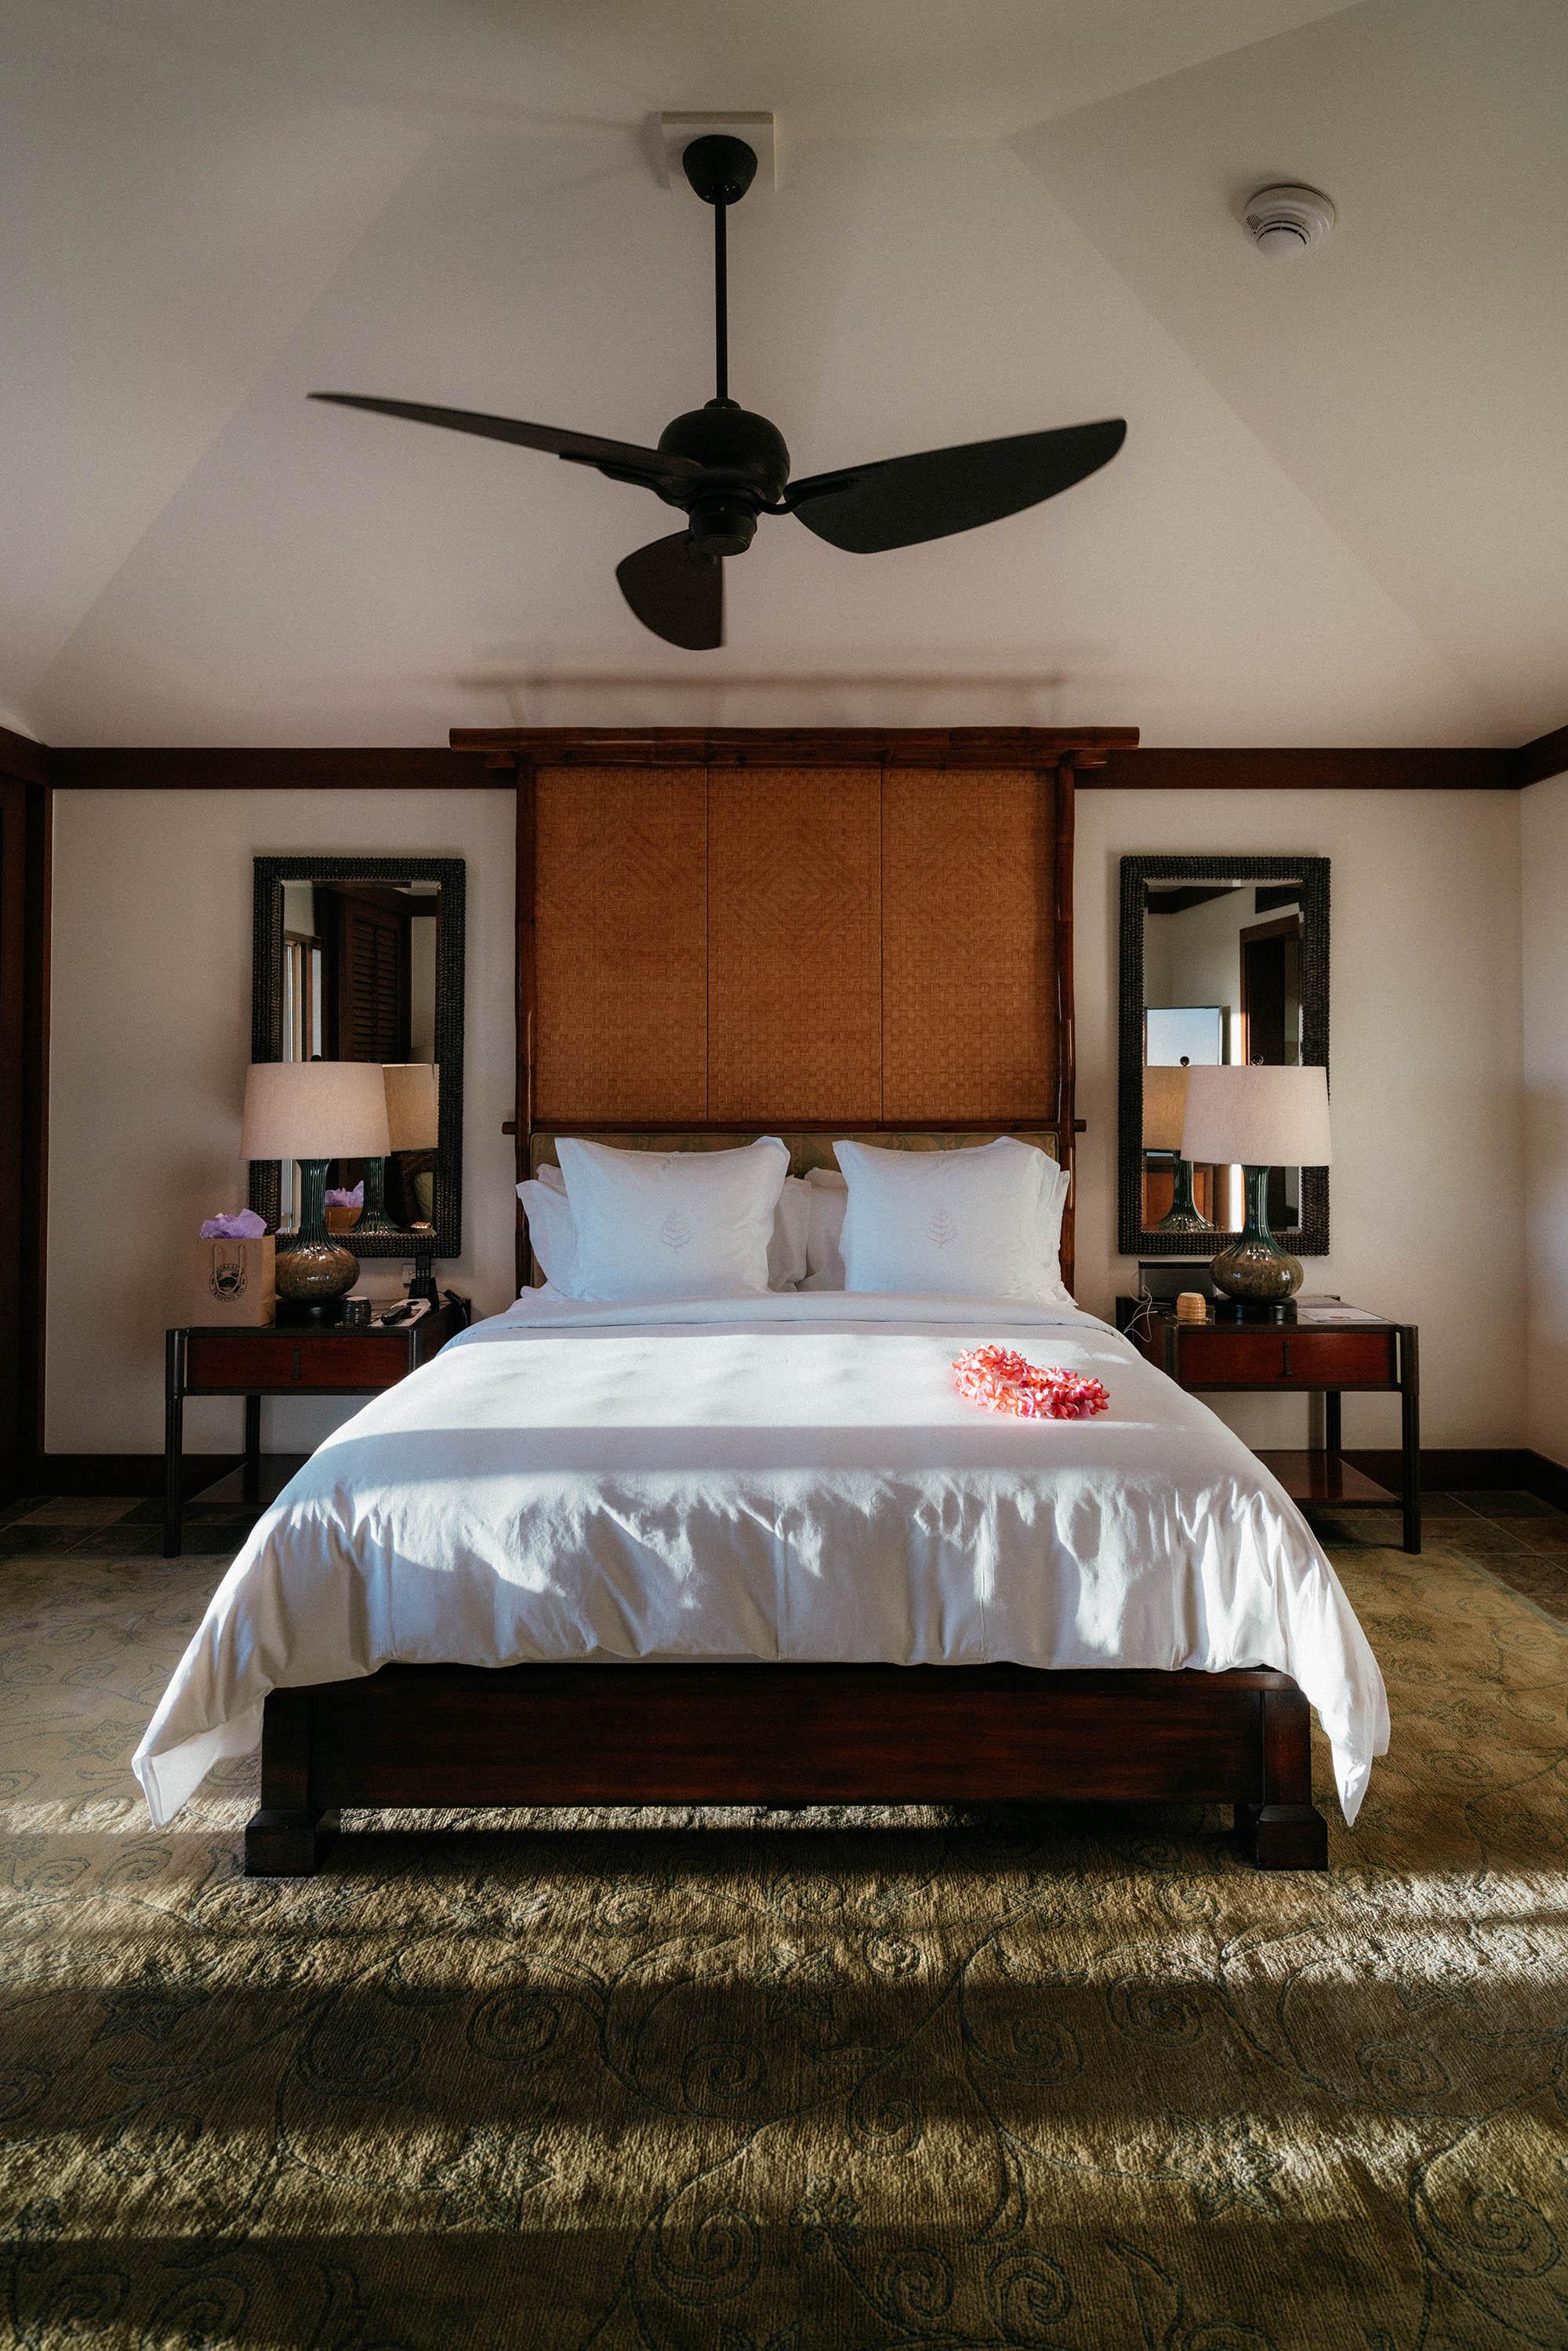 Our bedroom in the ocean view suite!